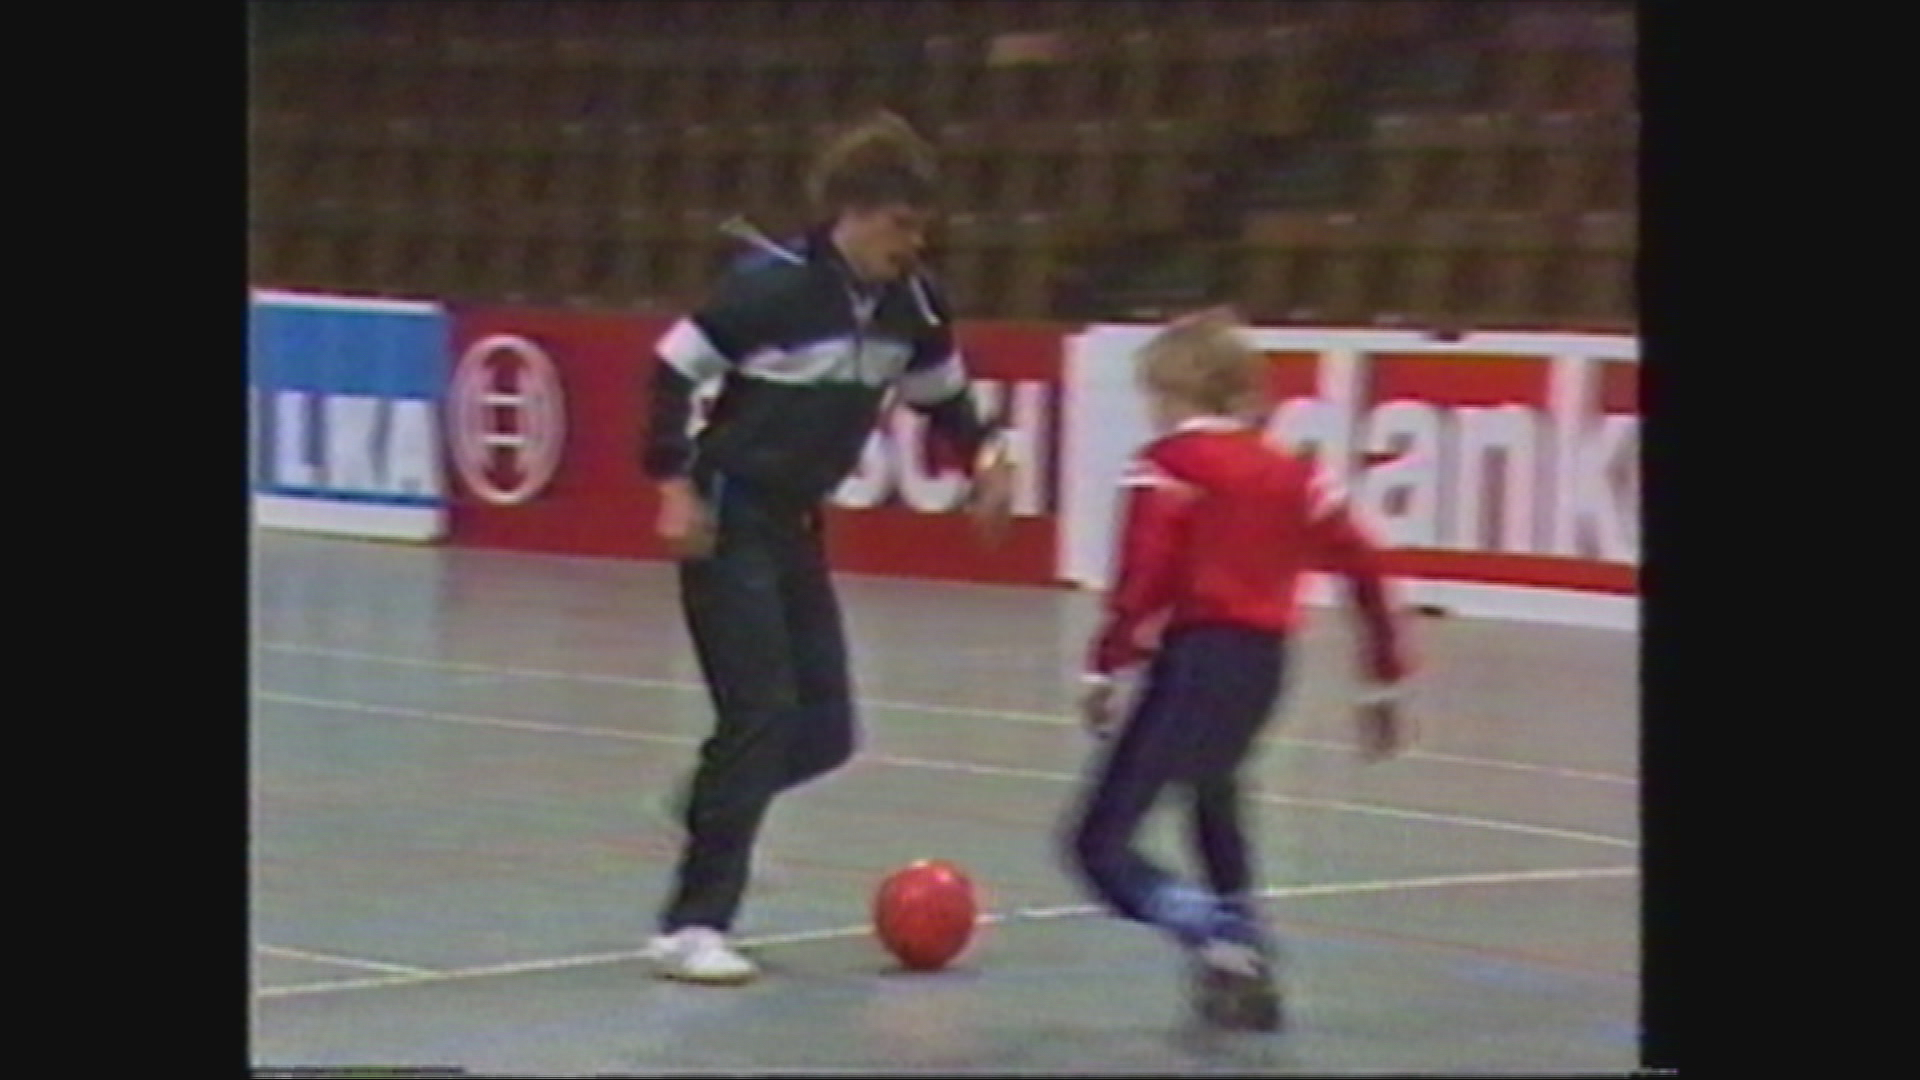 Frank Arnesen dribler uden om en ung dreng.